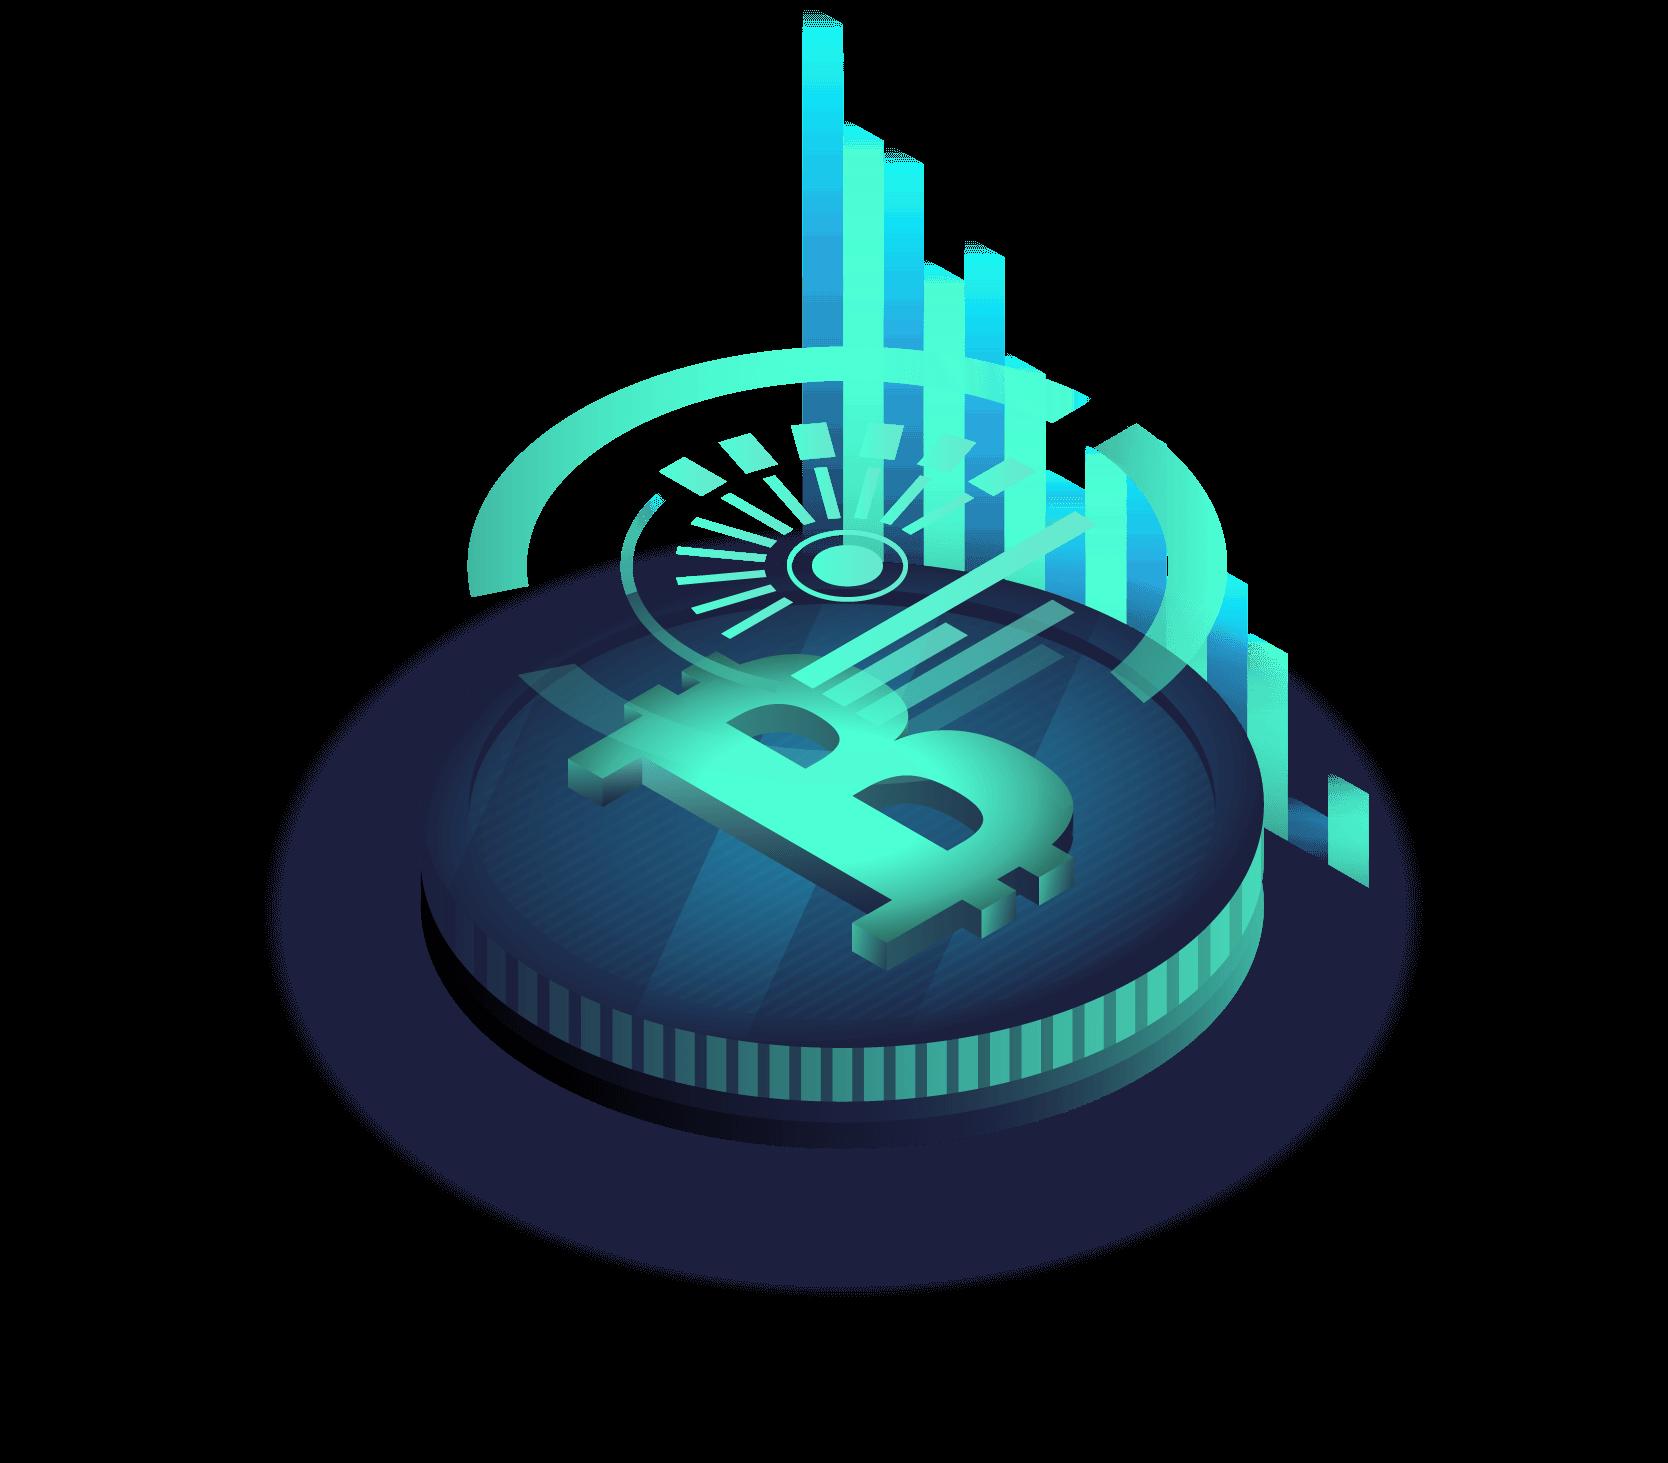 ValutaChange Zukunft v1